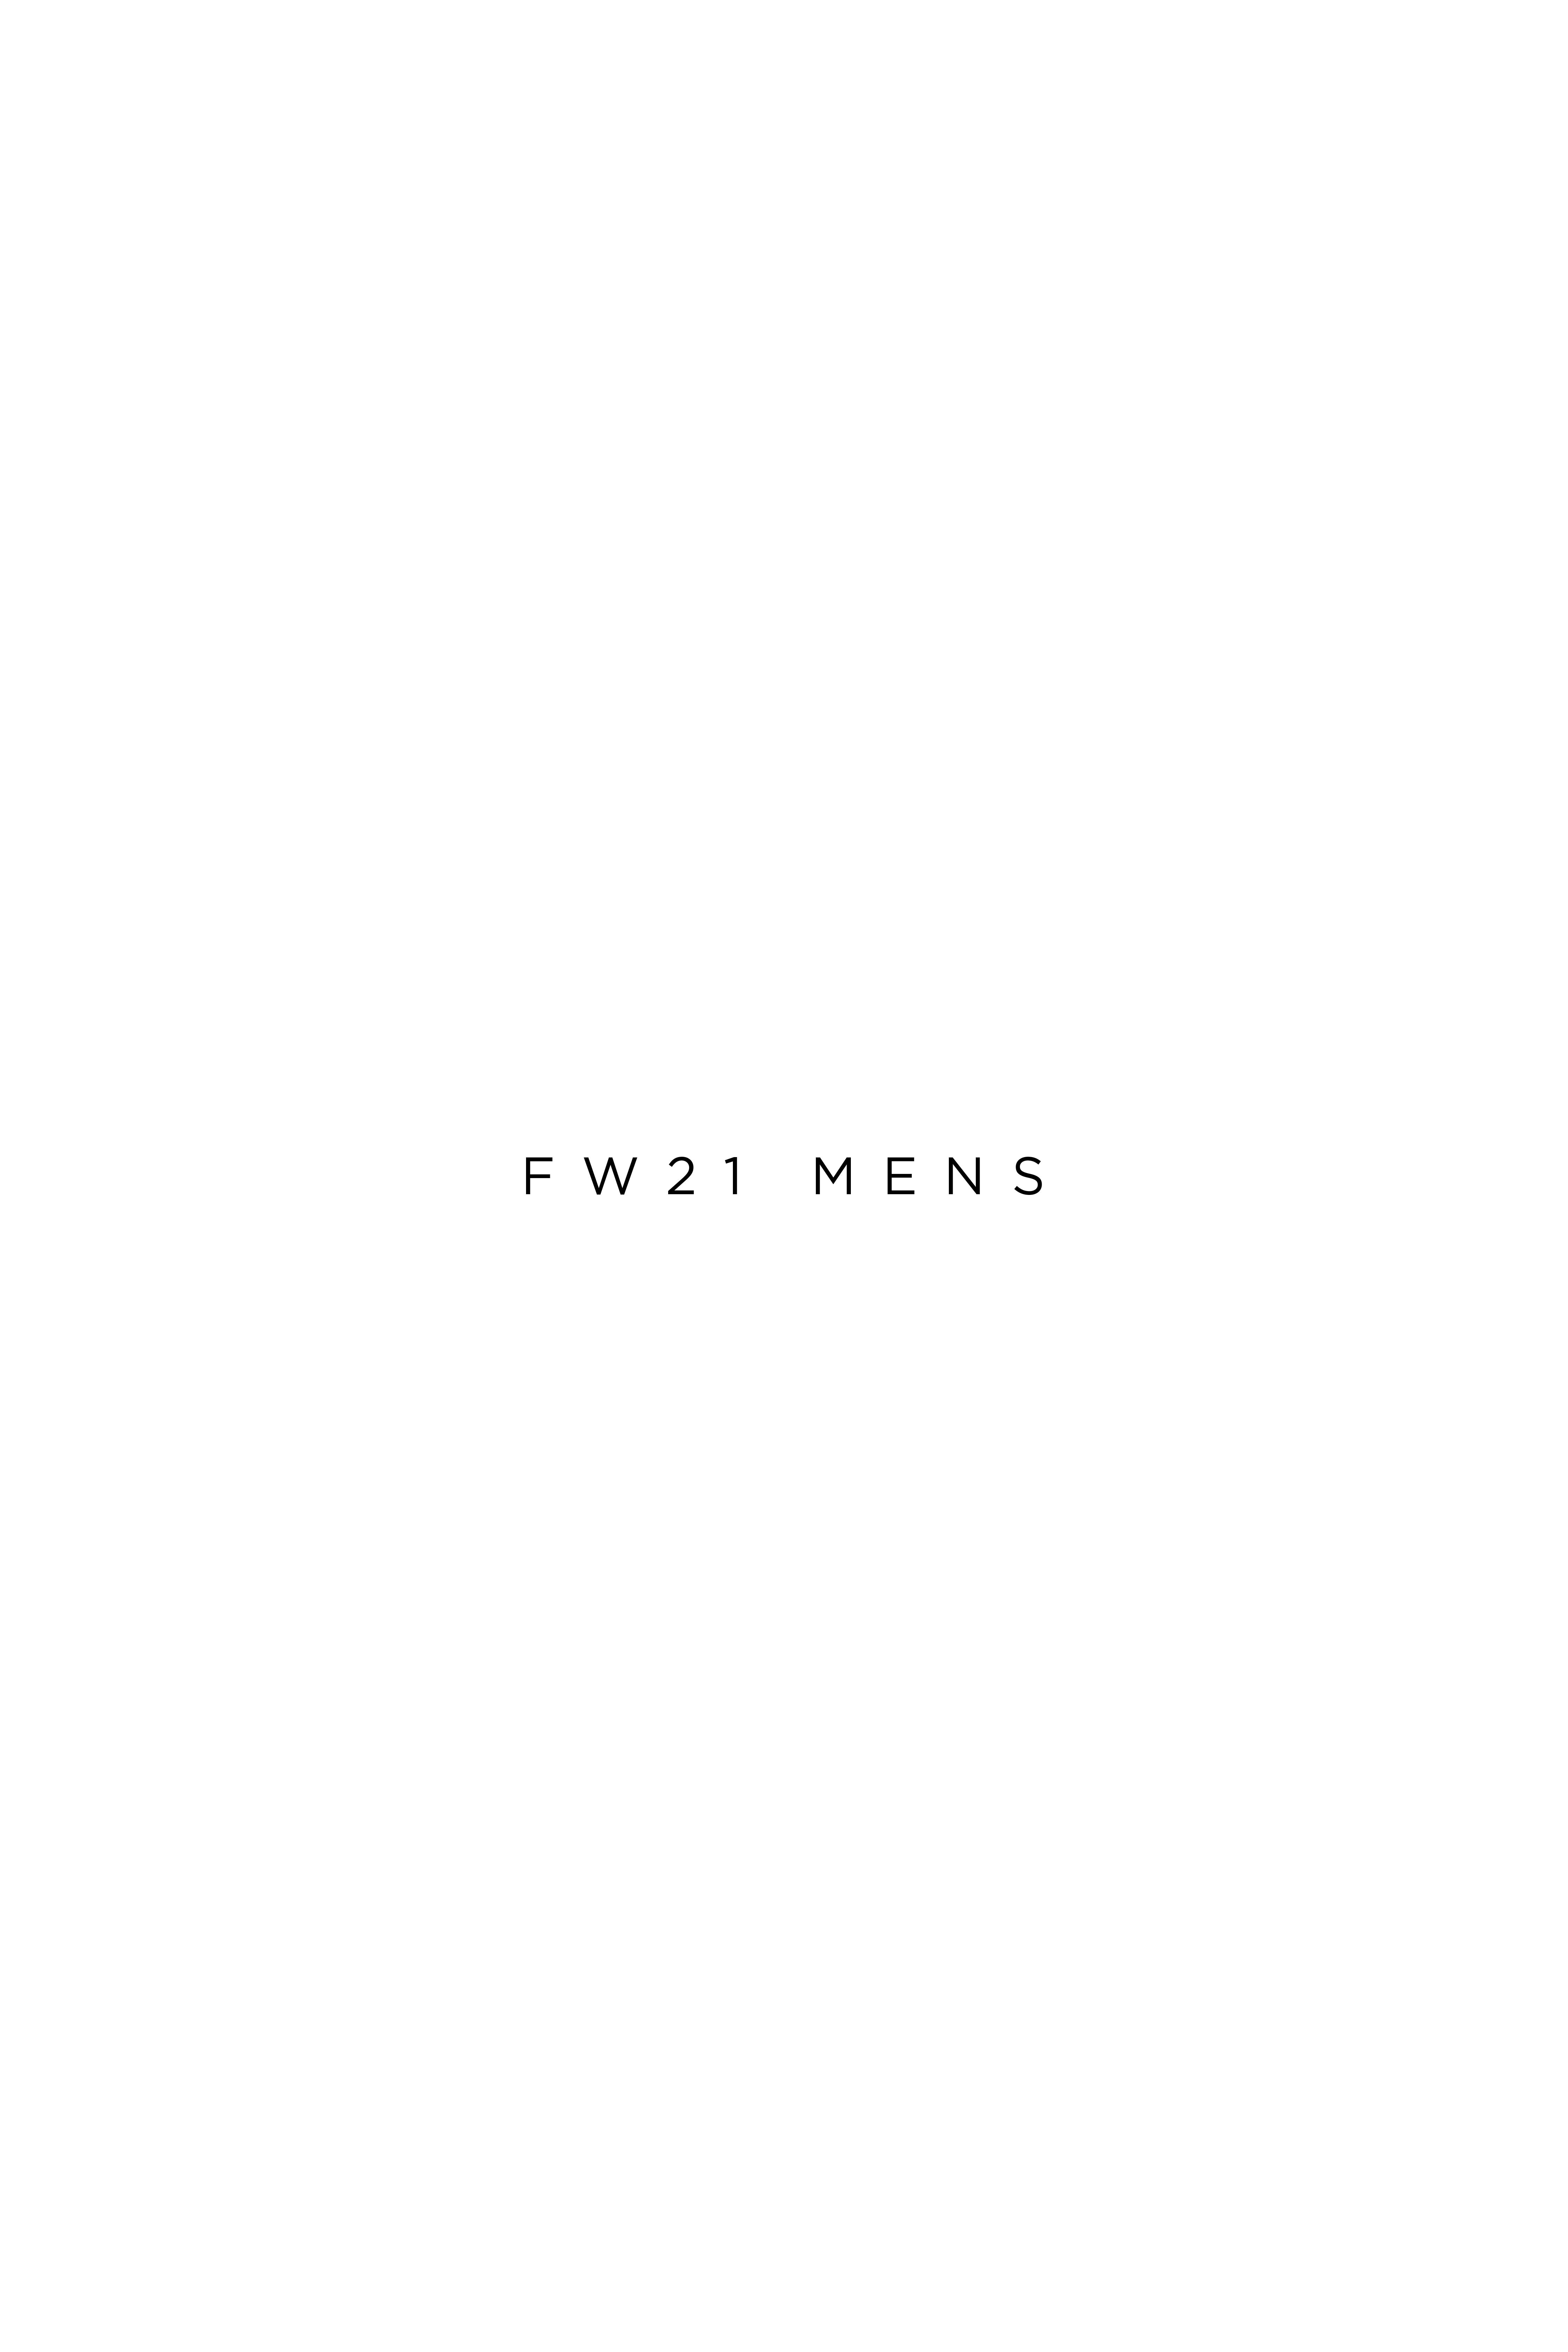 Fw21 mens